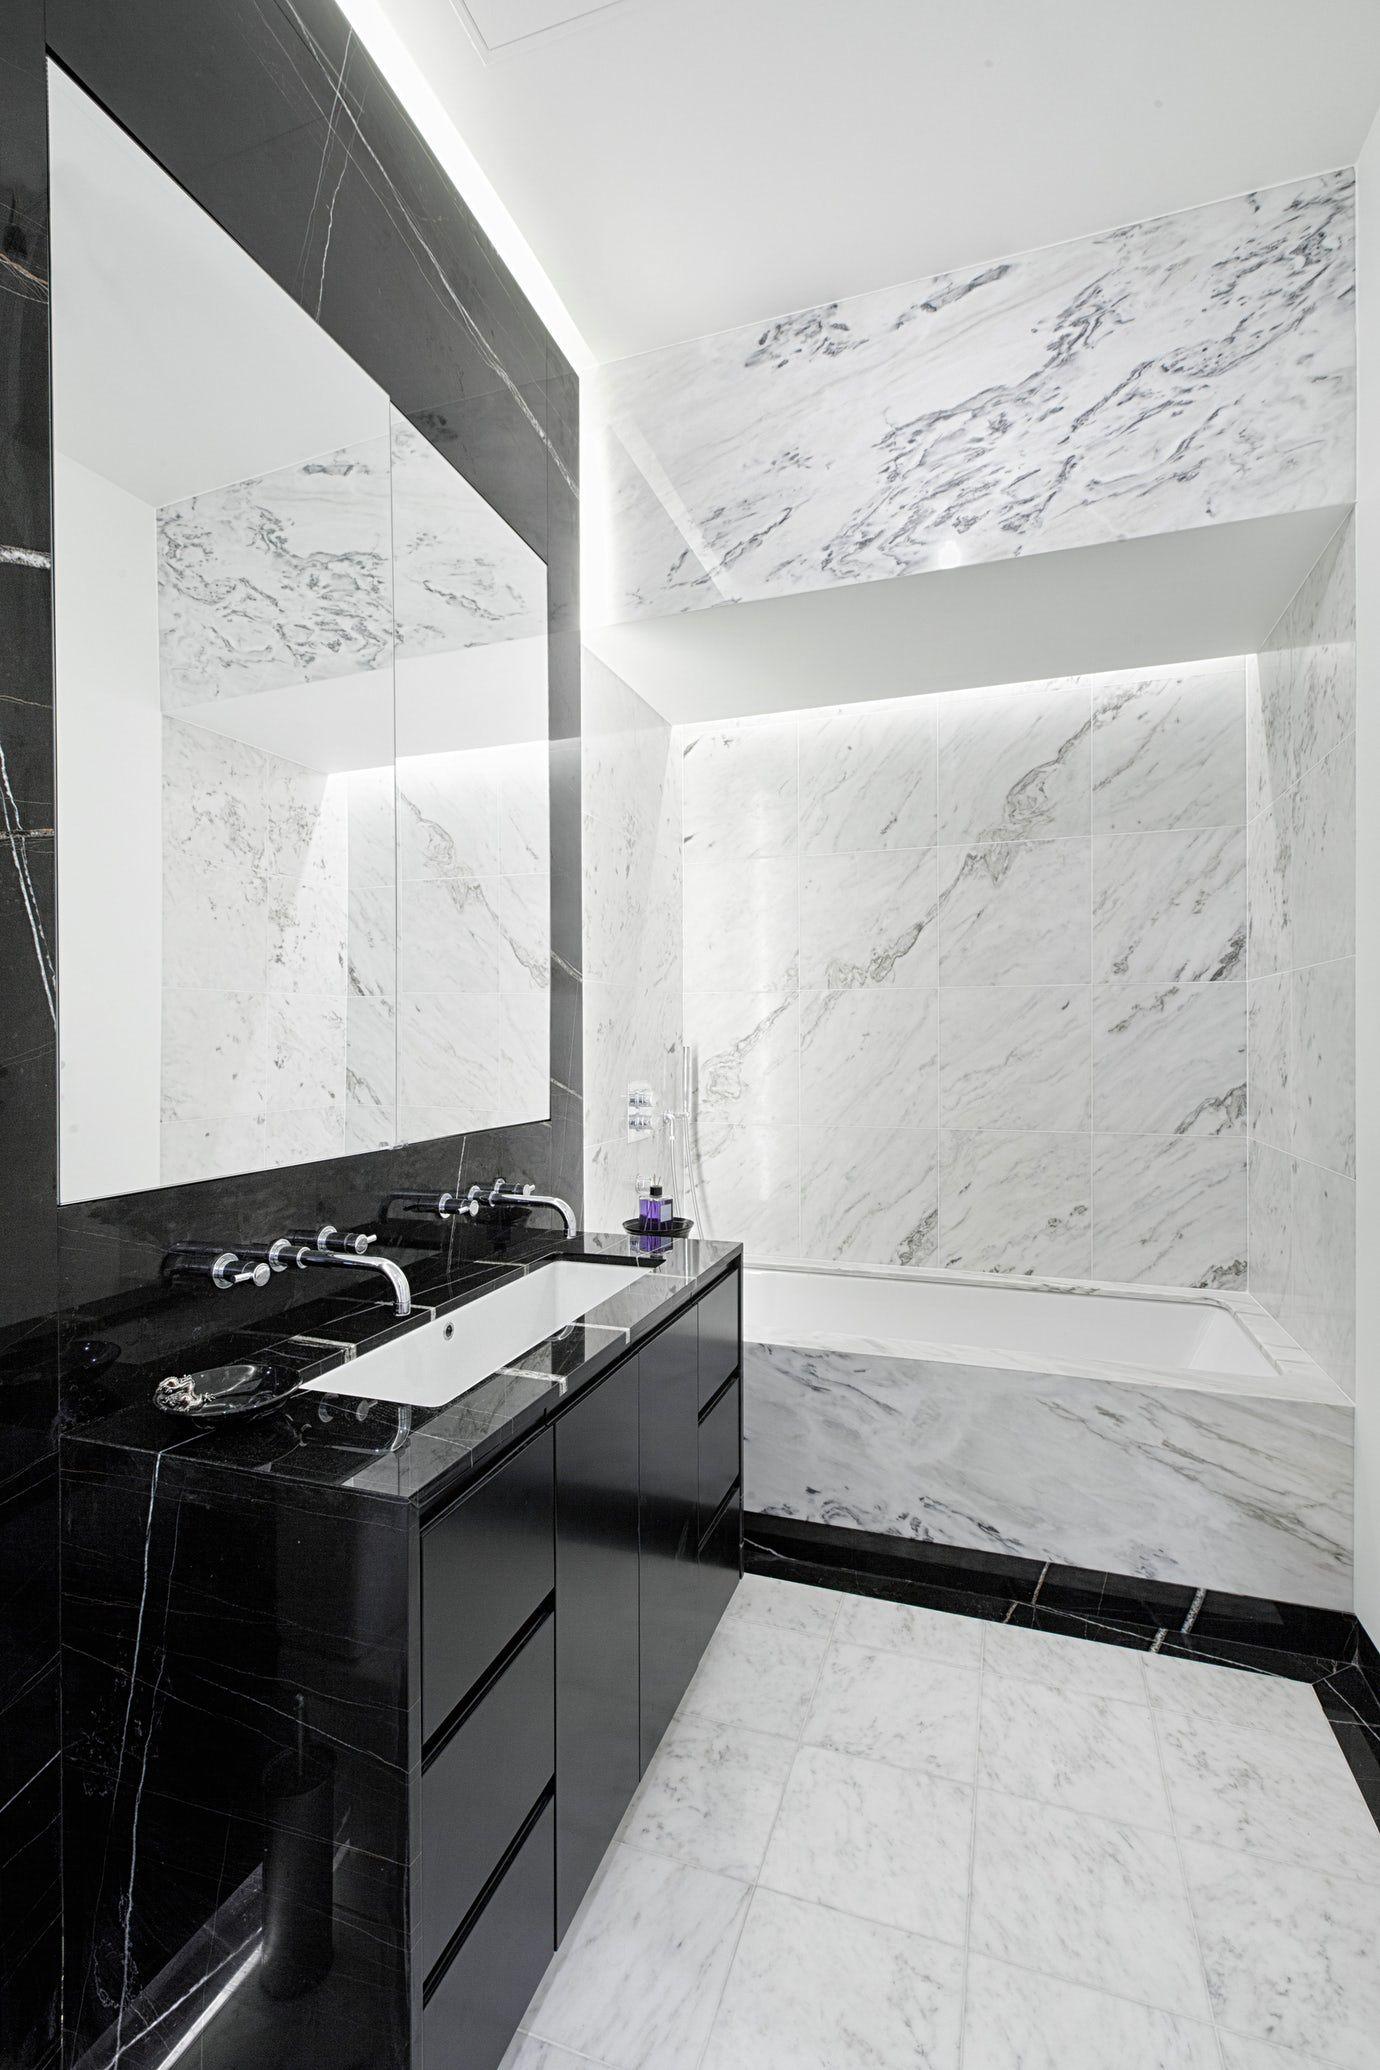 Virtus design interior designer in new york ny 10001 ladies mile residence bath contemporary